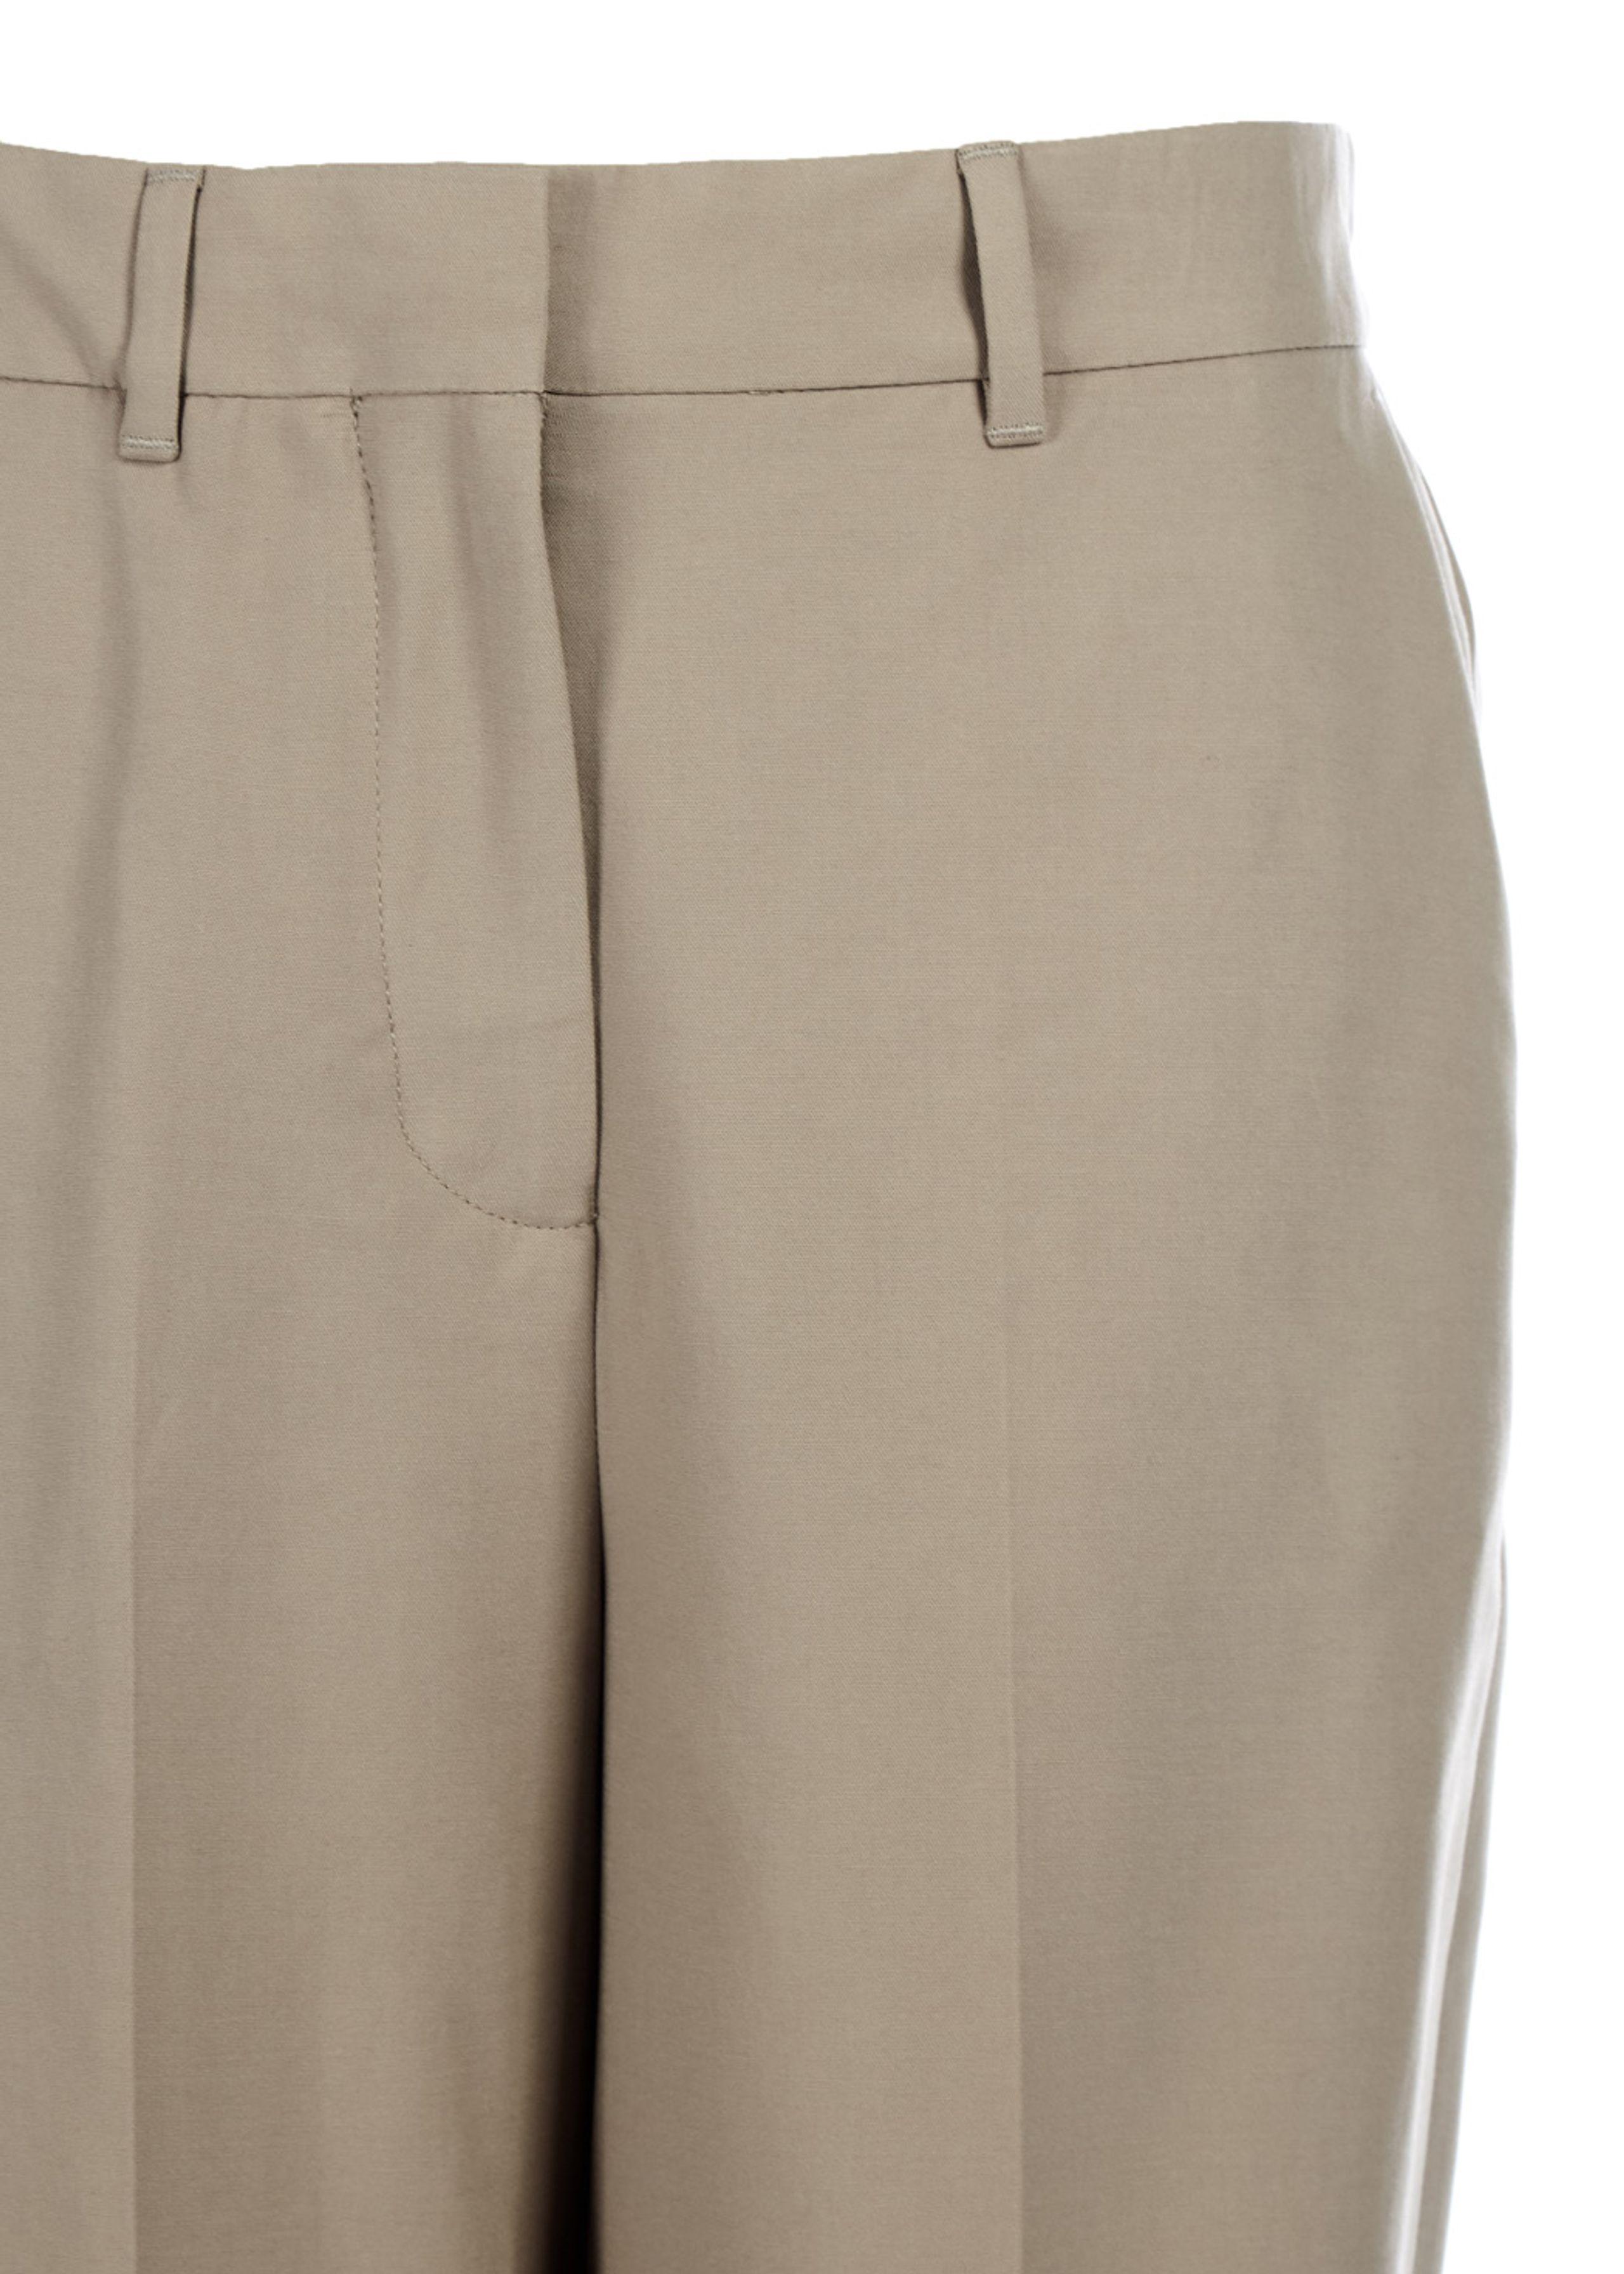 ffc02ab6 ... Selected Femme - Pants - Joy Cropped Pants - Beige ...